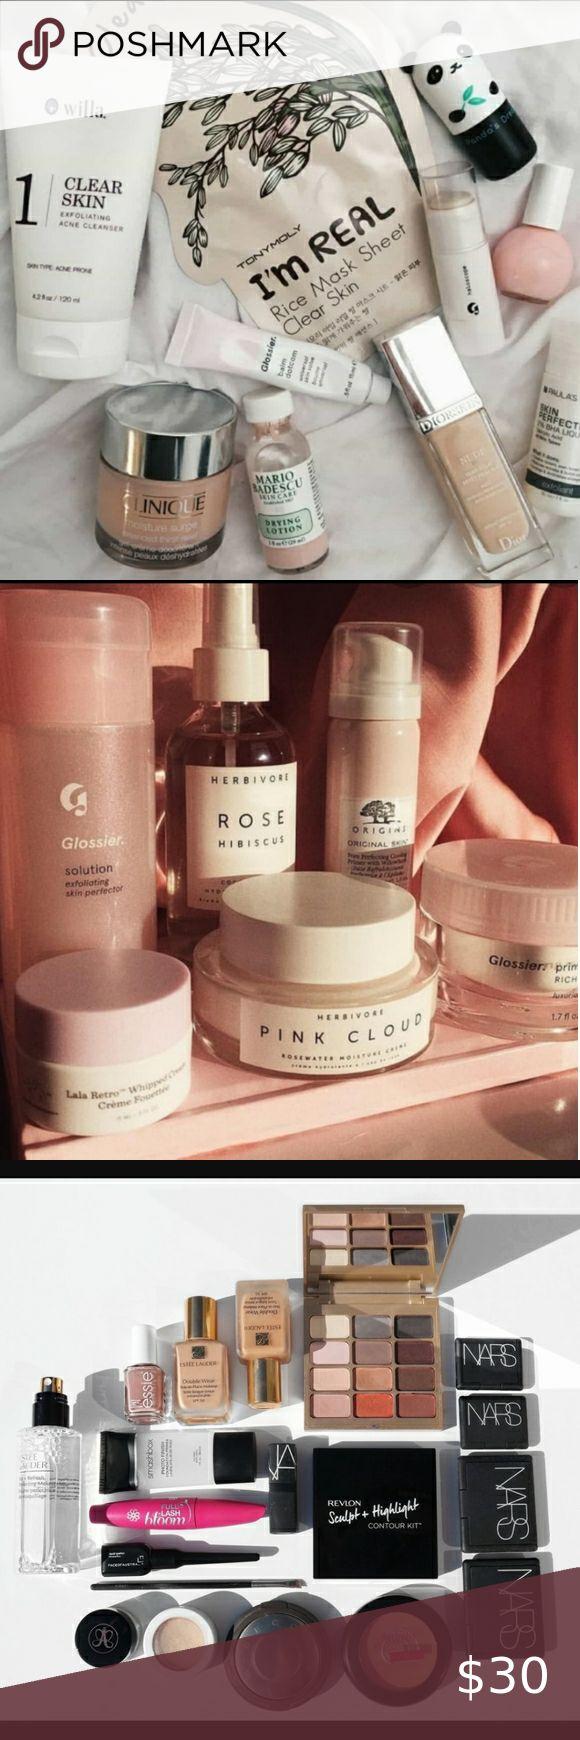 MYSTERY BEAUTY BOX! in 2020 Beauty box, Makeup items, Beauty